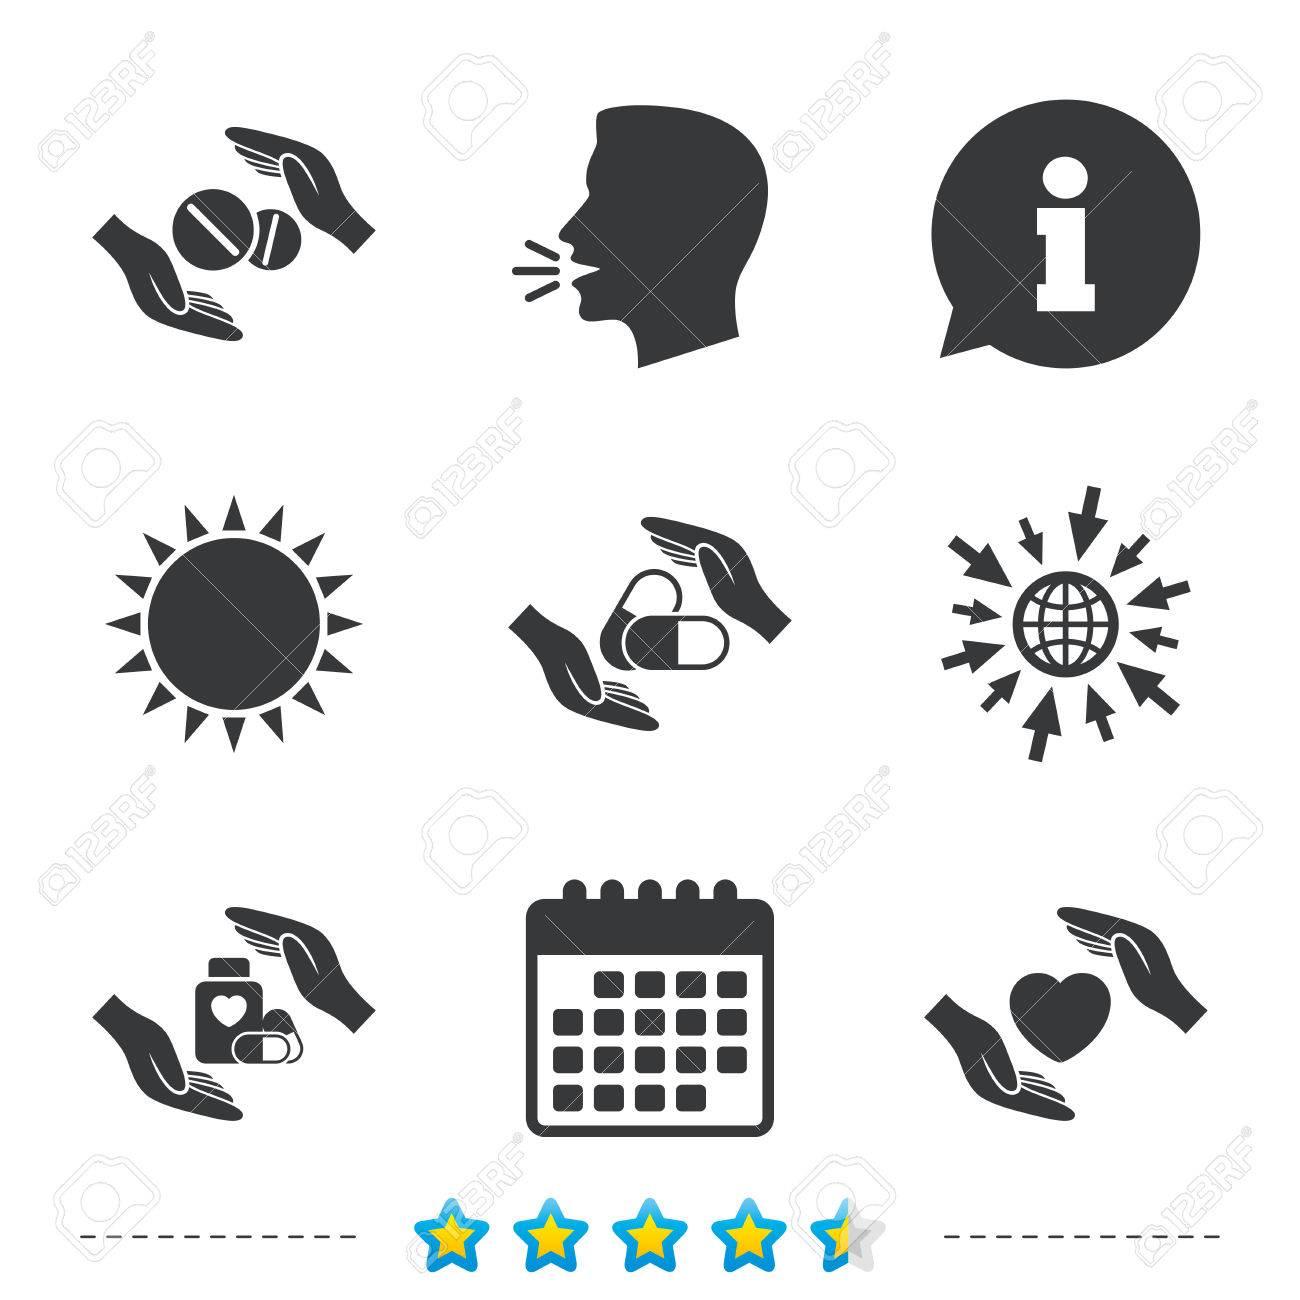 Hands Insurance Icons Health Medical Insurance Symbols Pills